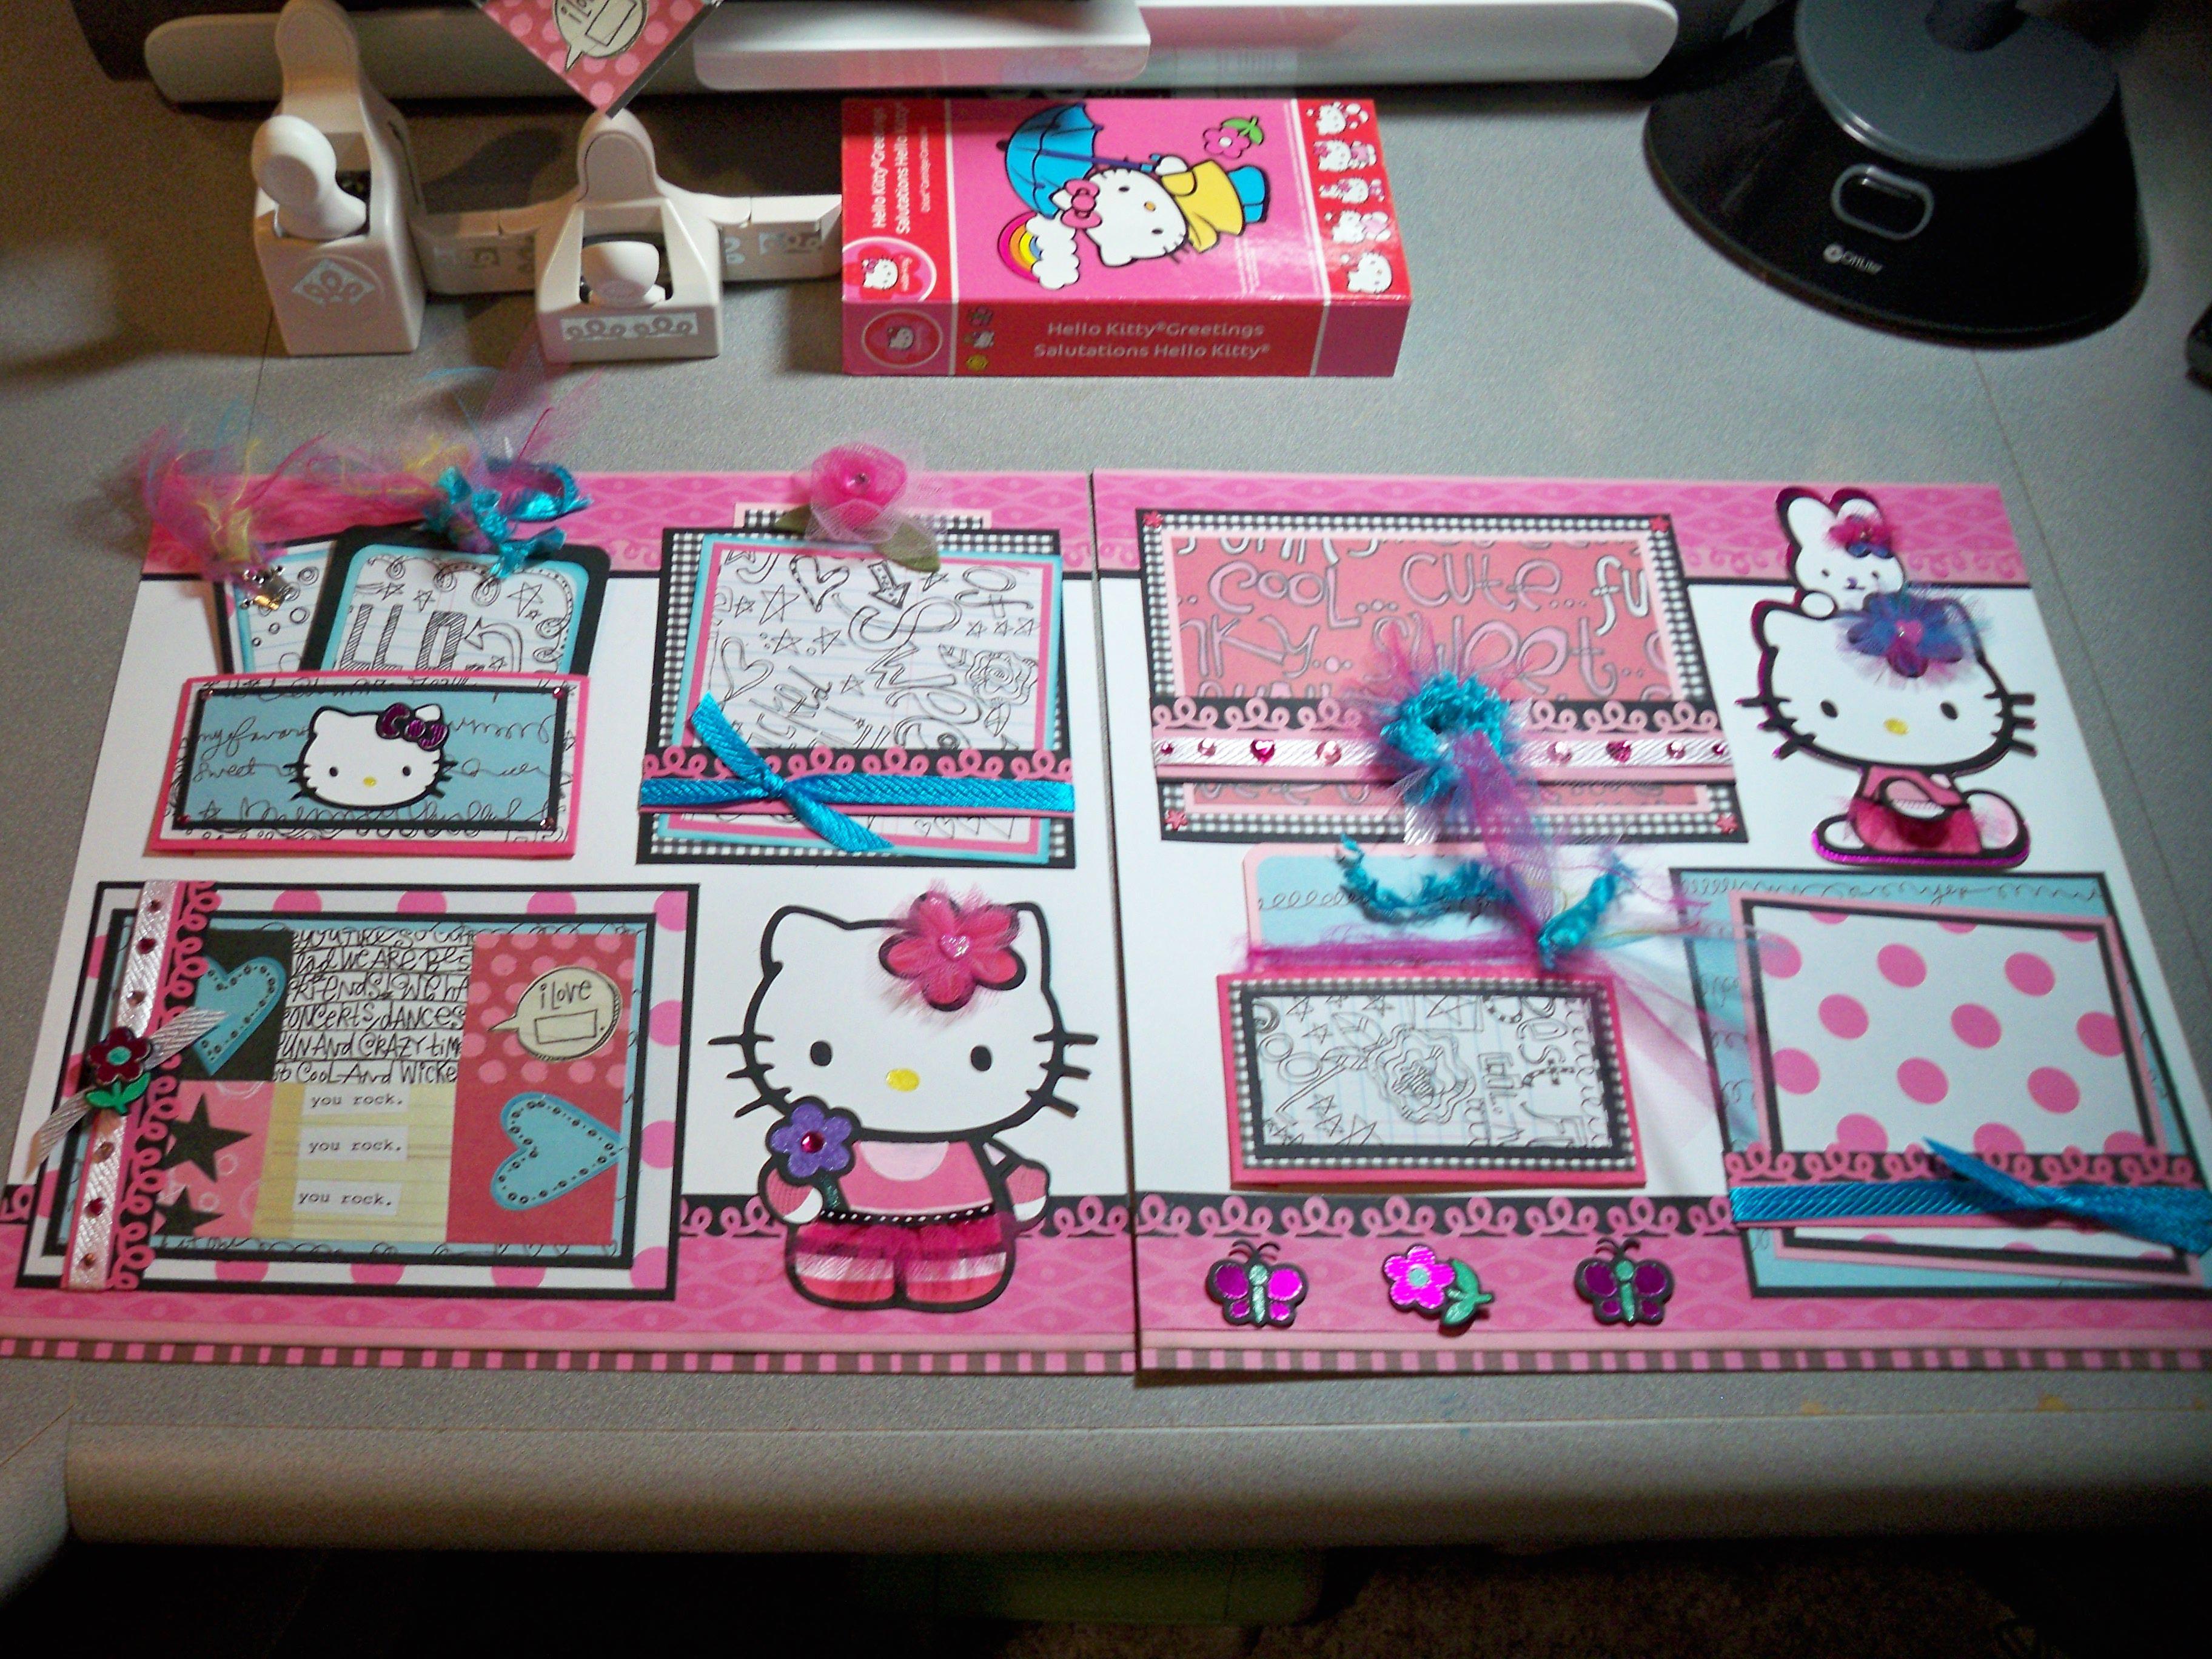 Hello kitty scrapbook ideas - Hello Kitty Scarupbook Cricut Weekly Challenge I Want To Scrapbook